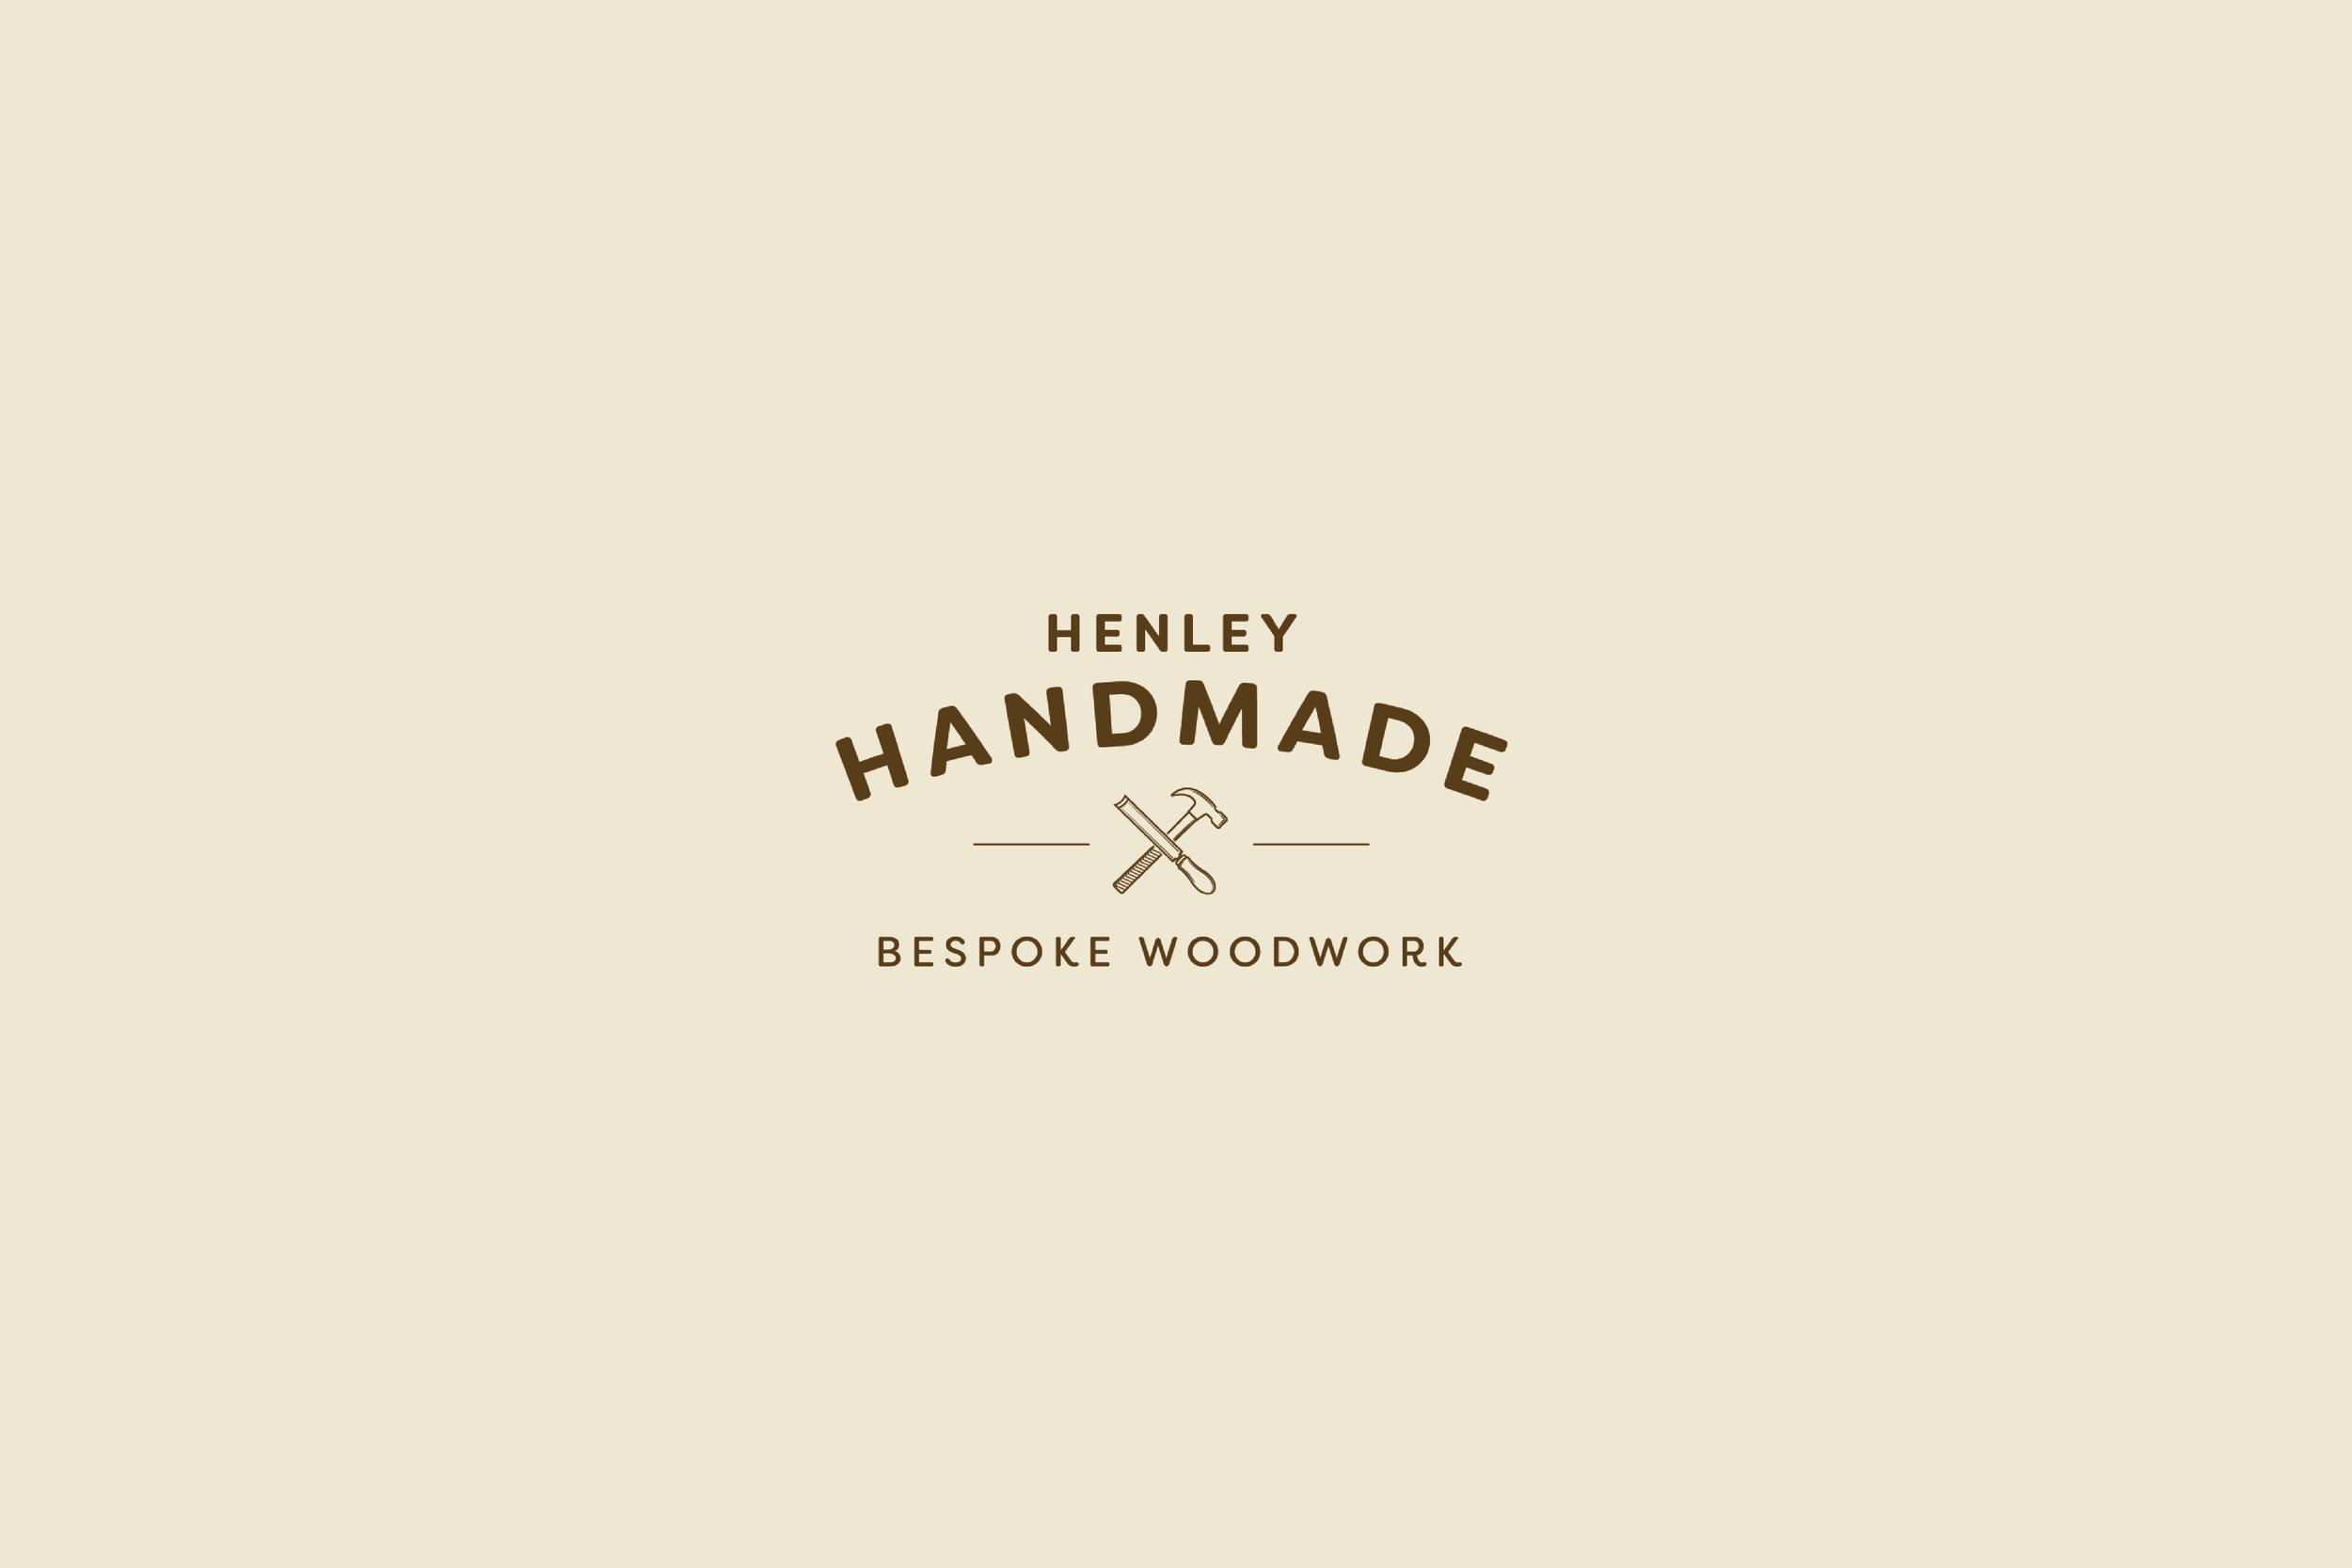 Bespoke and handmade wooden home furnishings